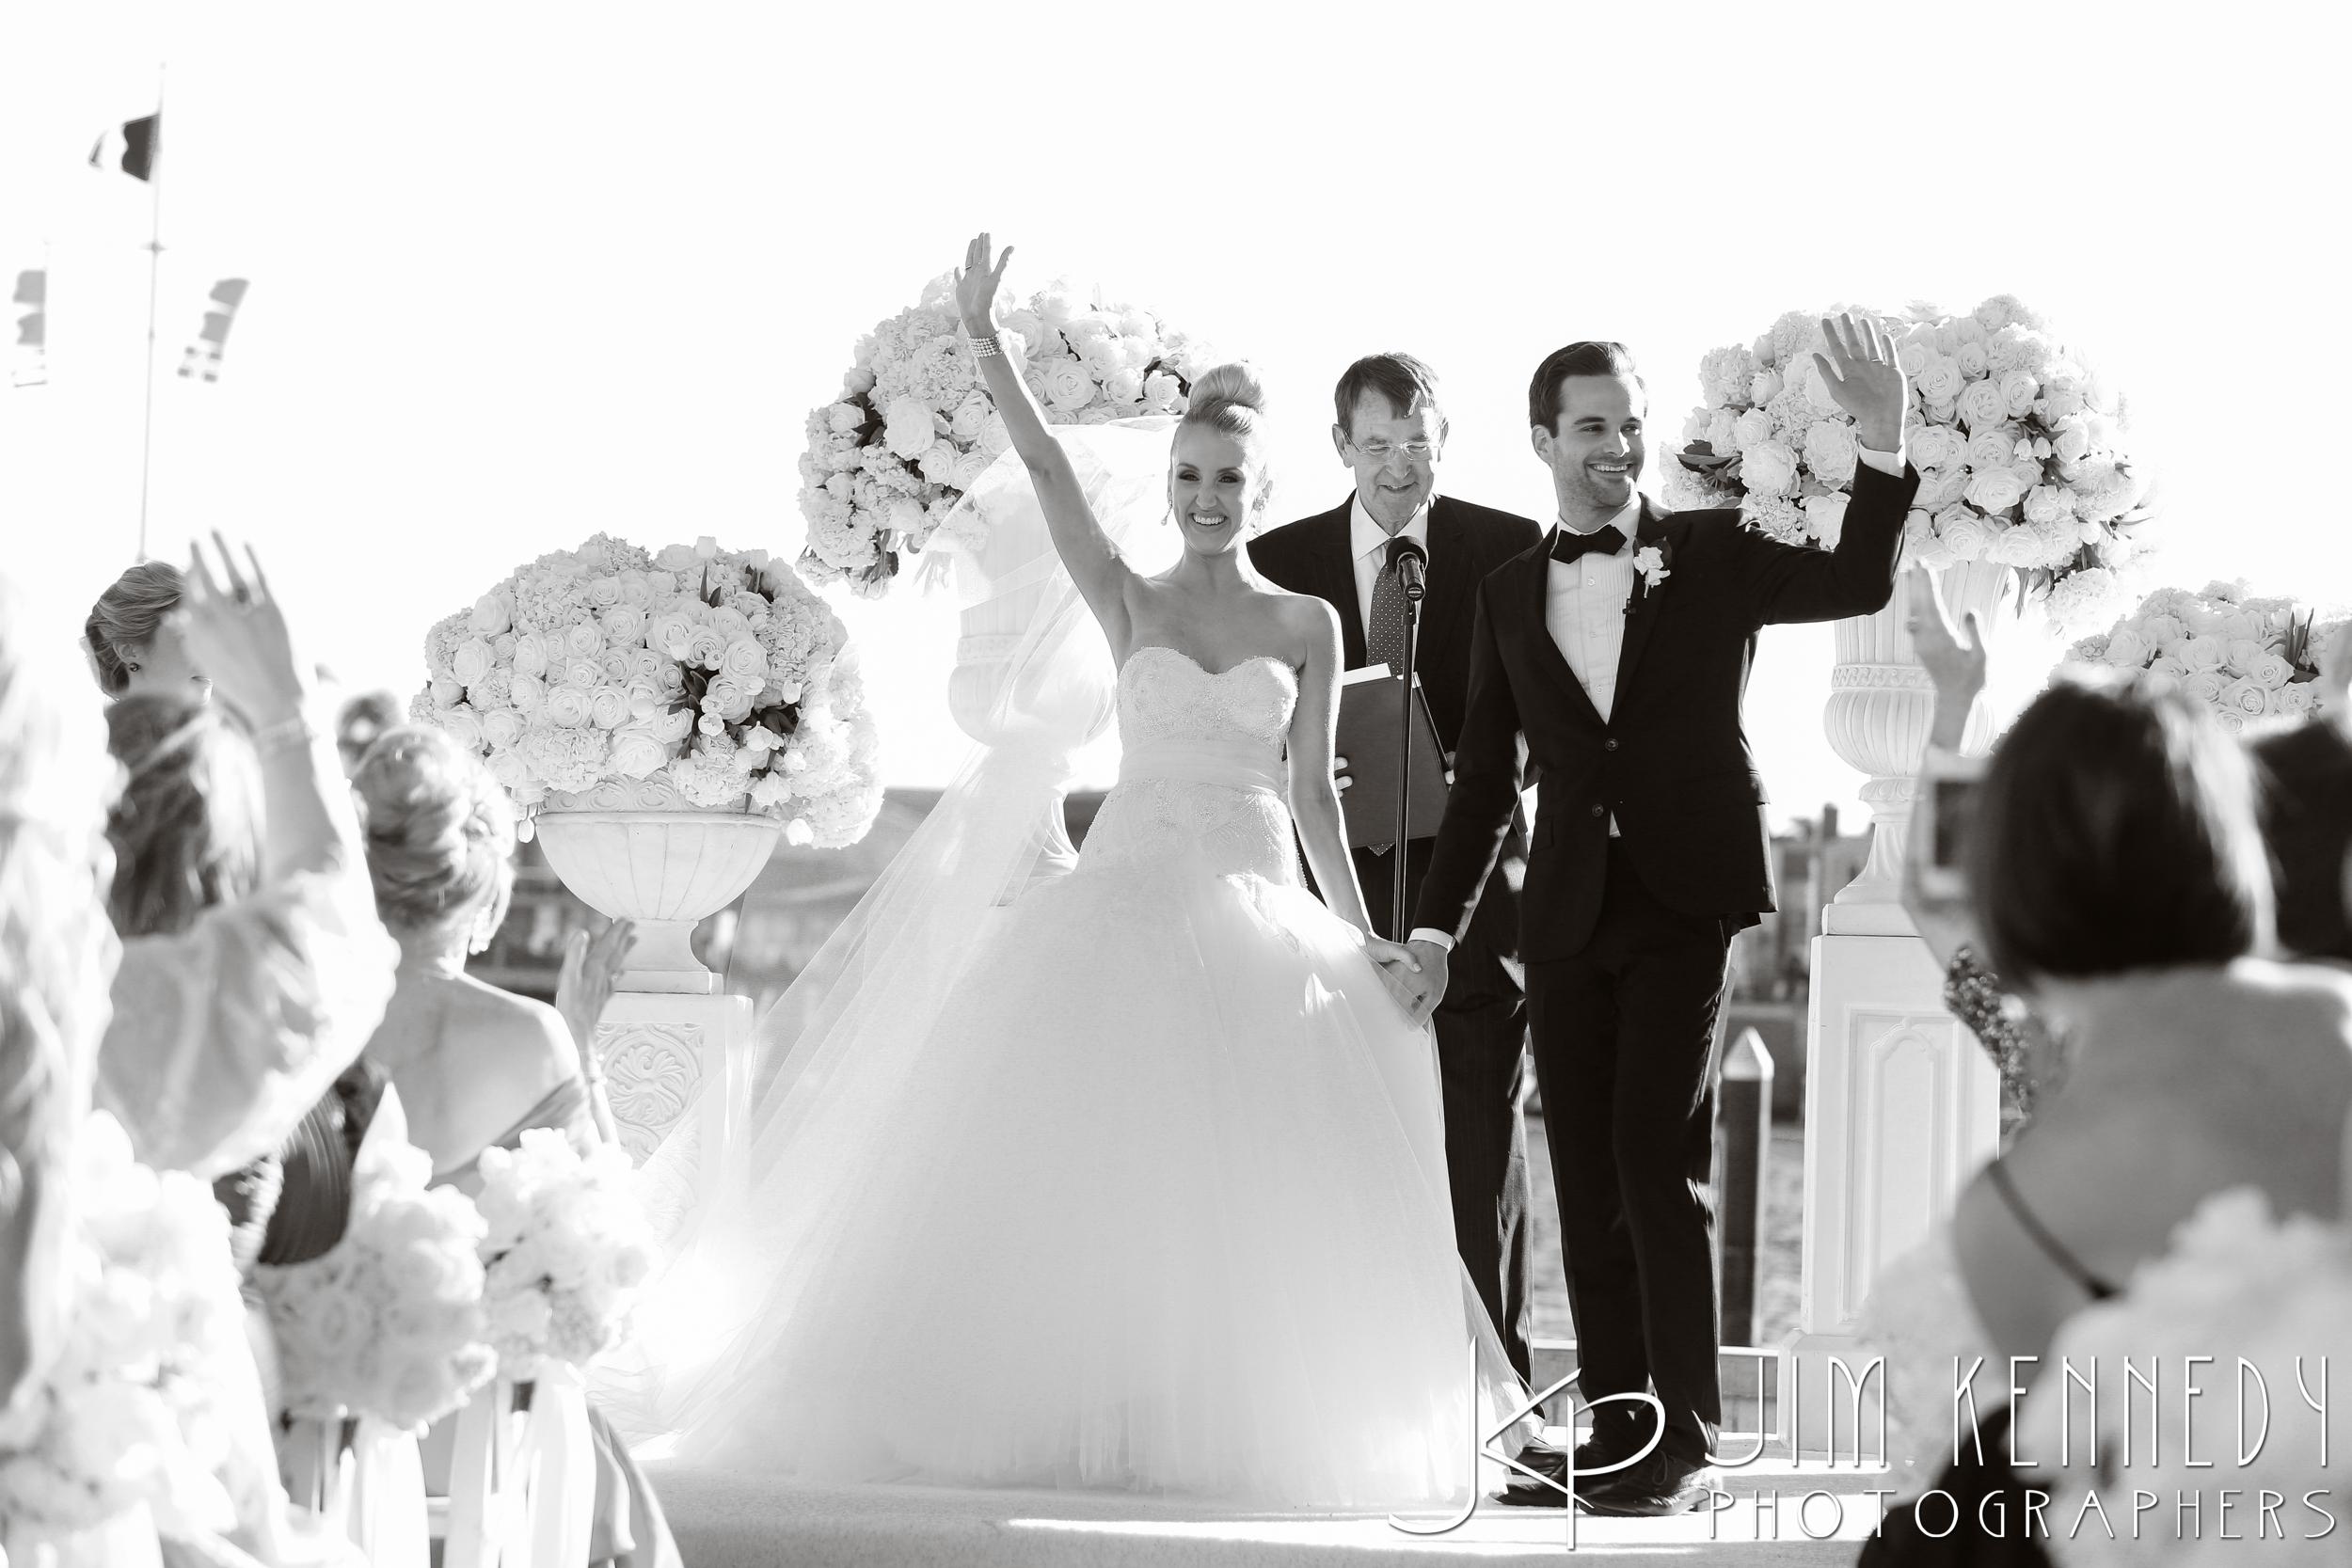 balboa-bay-resort-wedding-photography_0108.JPG